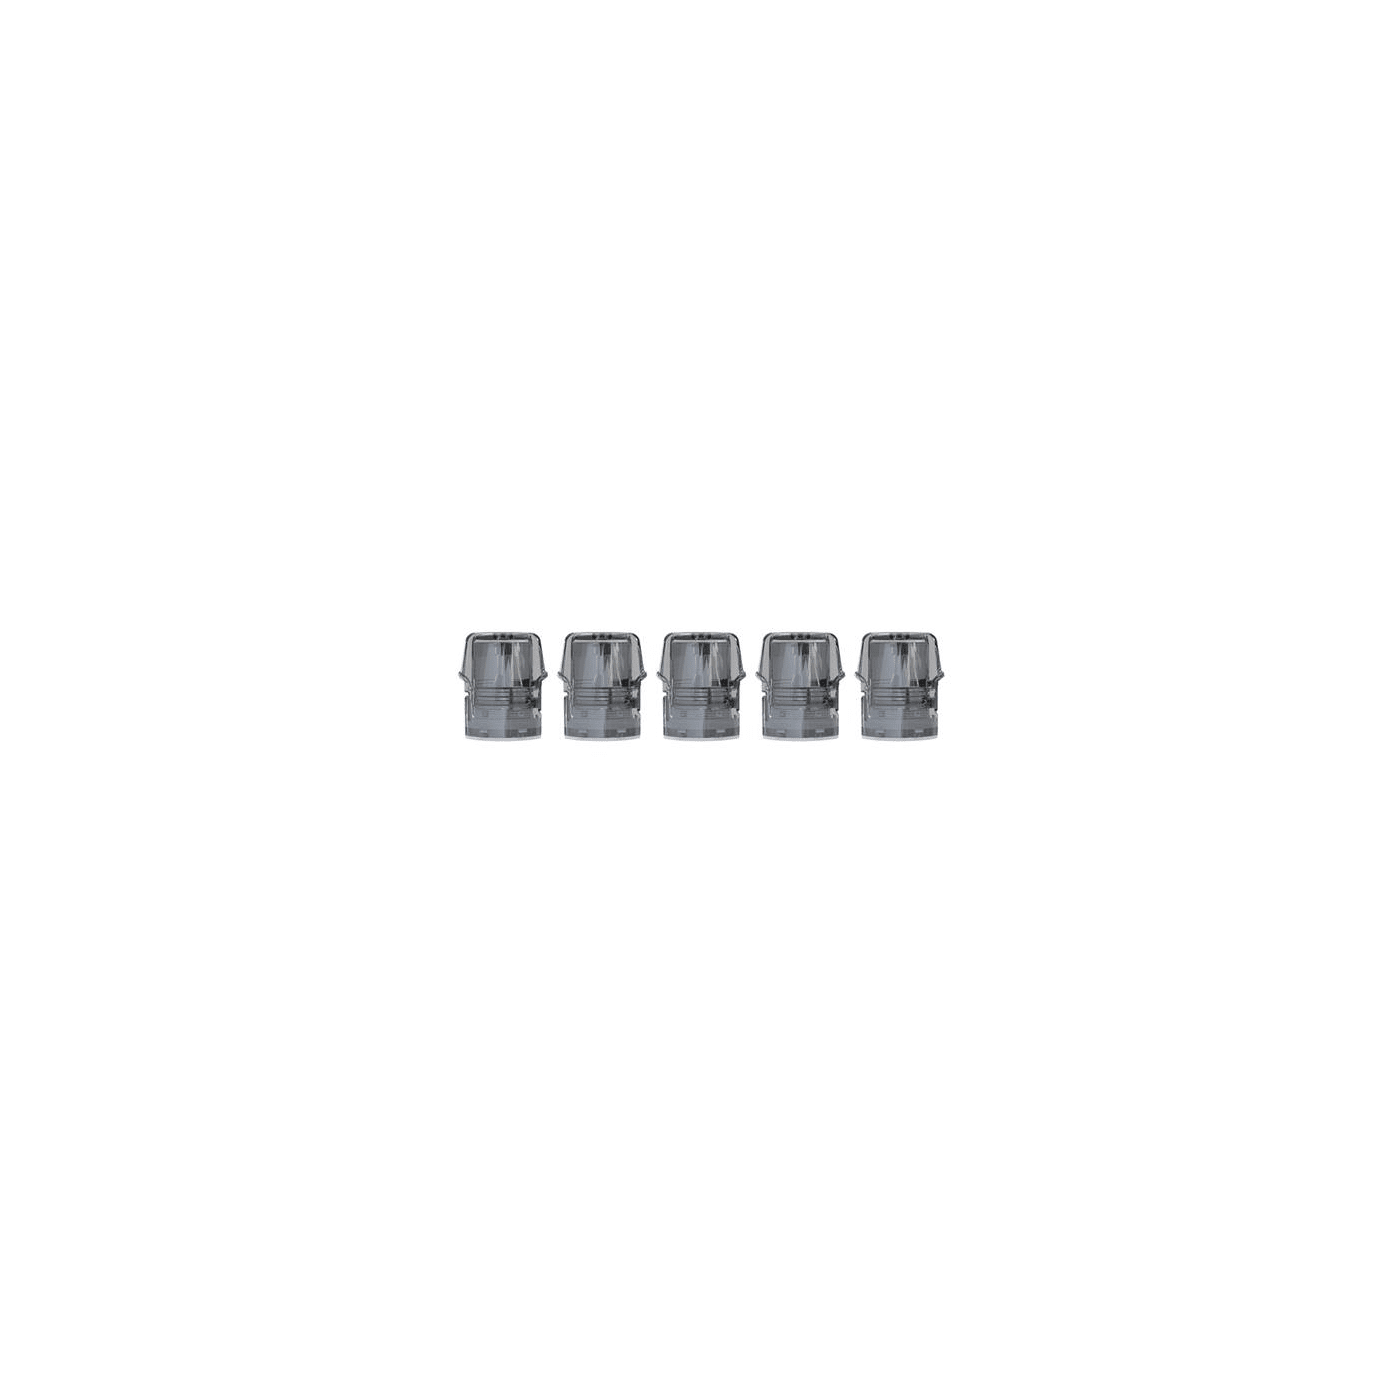 Joyetech RunAbout Replacement Cartridge - 5 pack